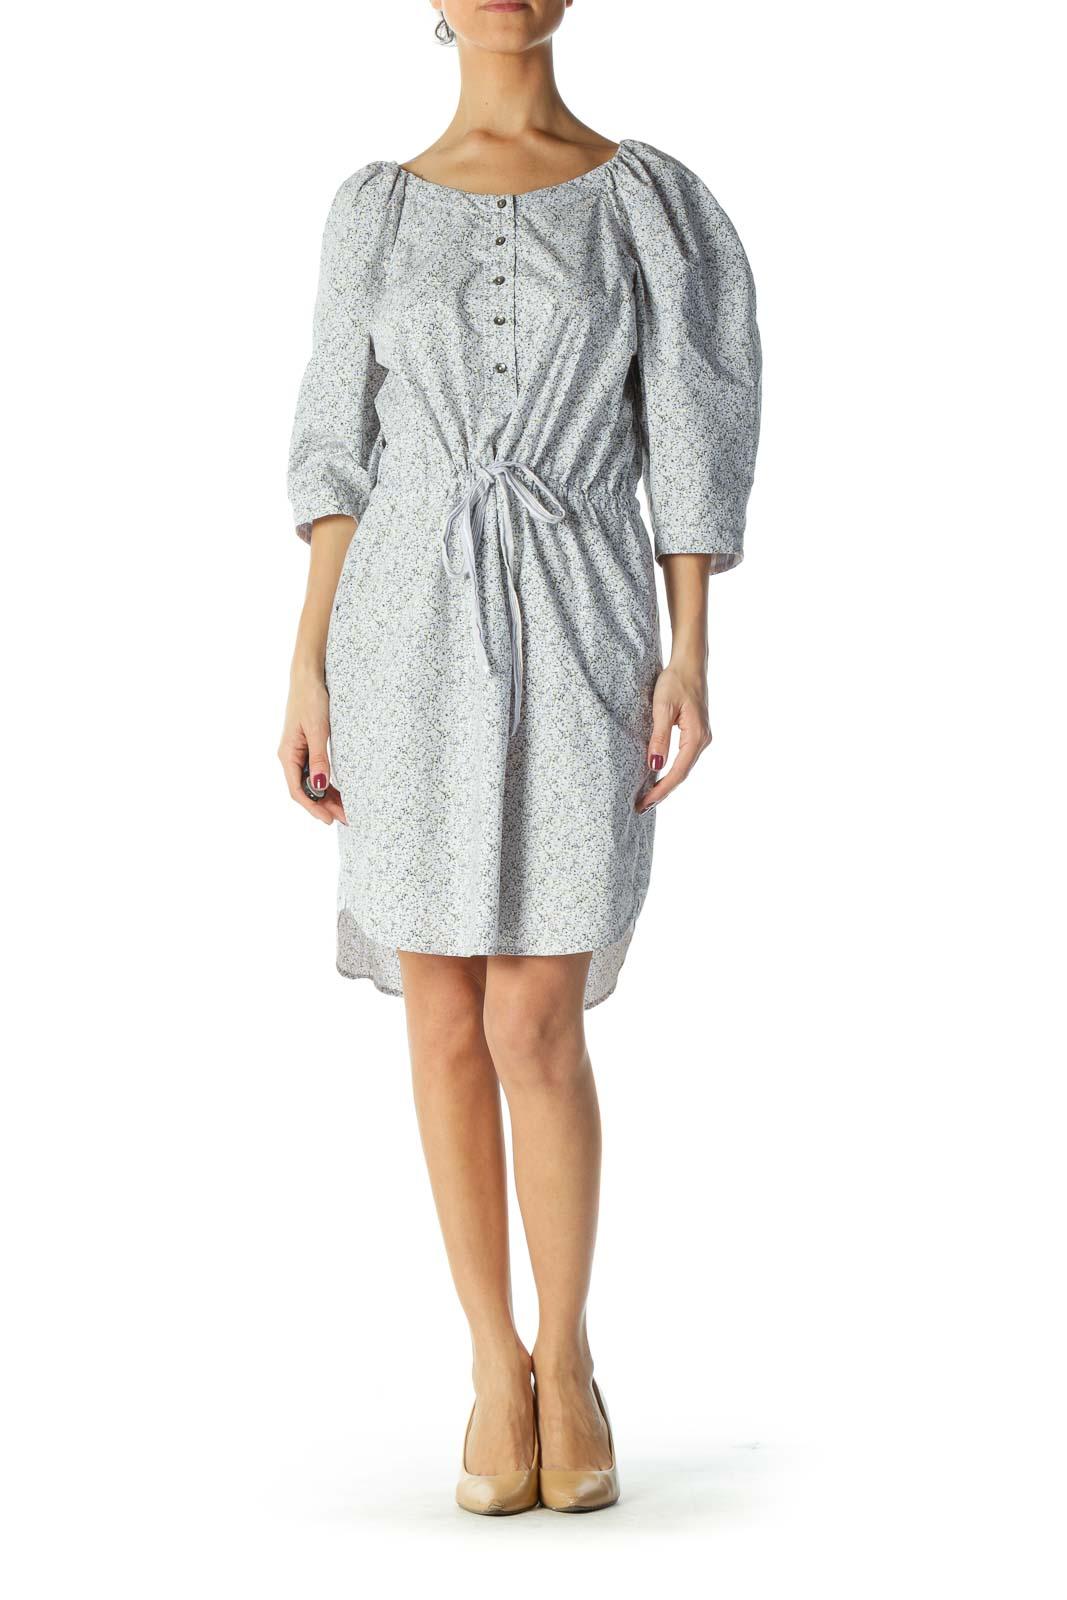 Blue Puff Sleeve Floral Print Dress